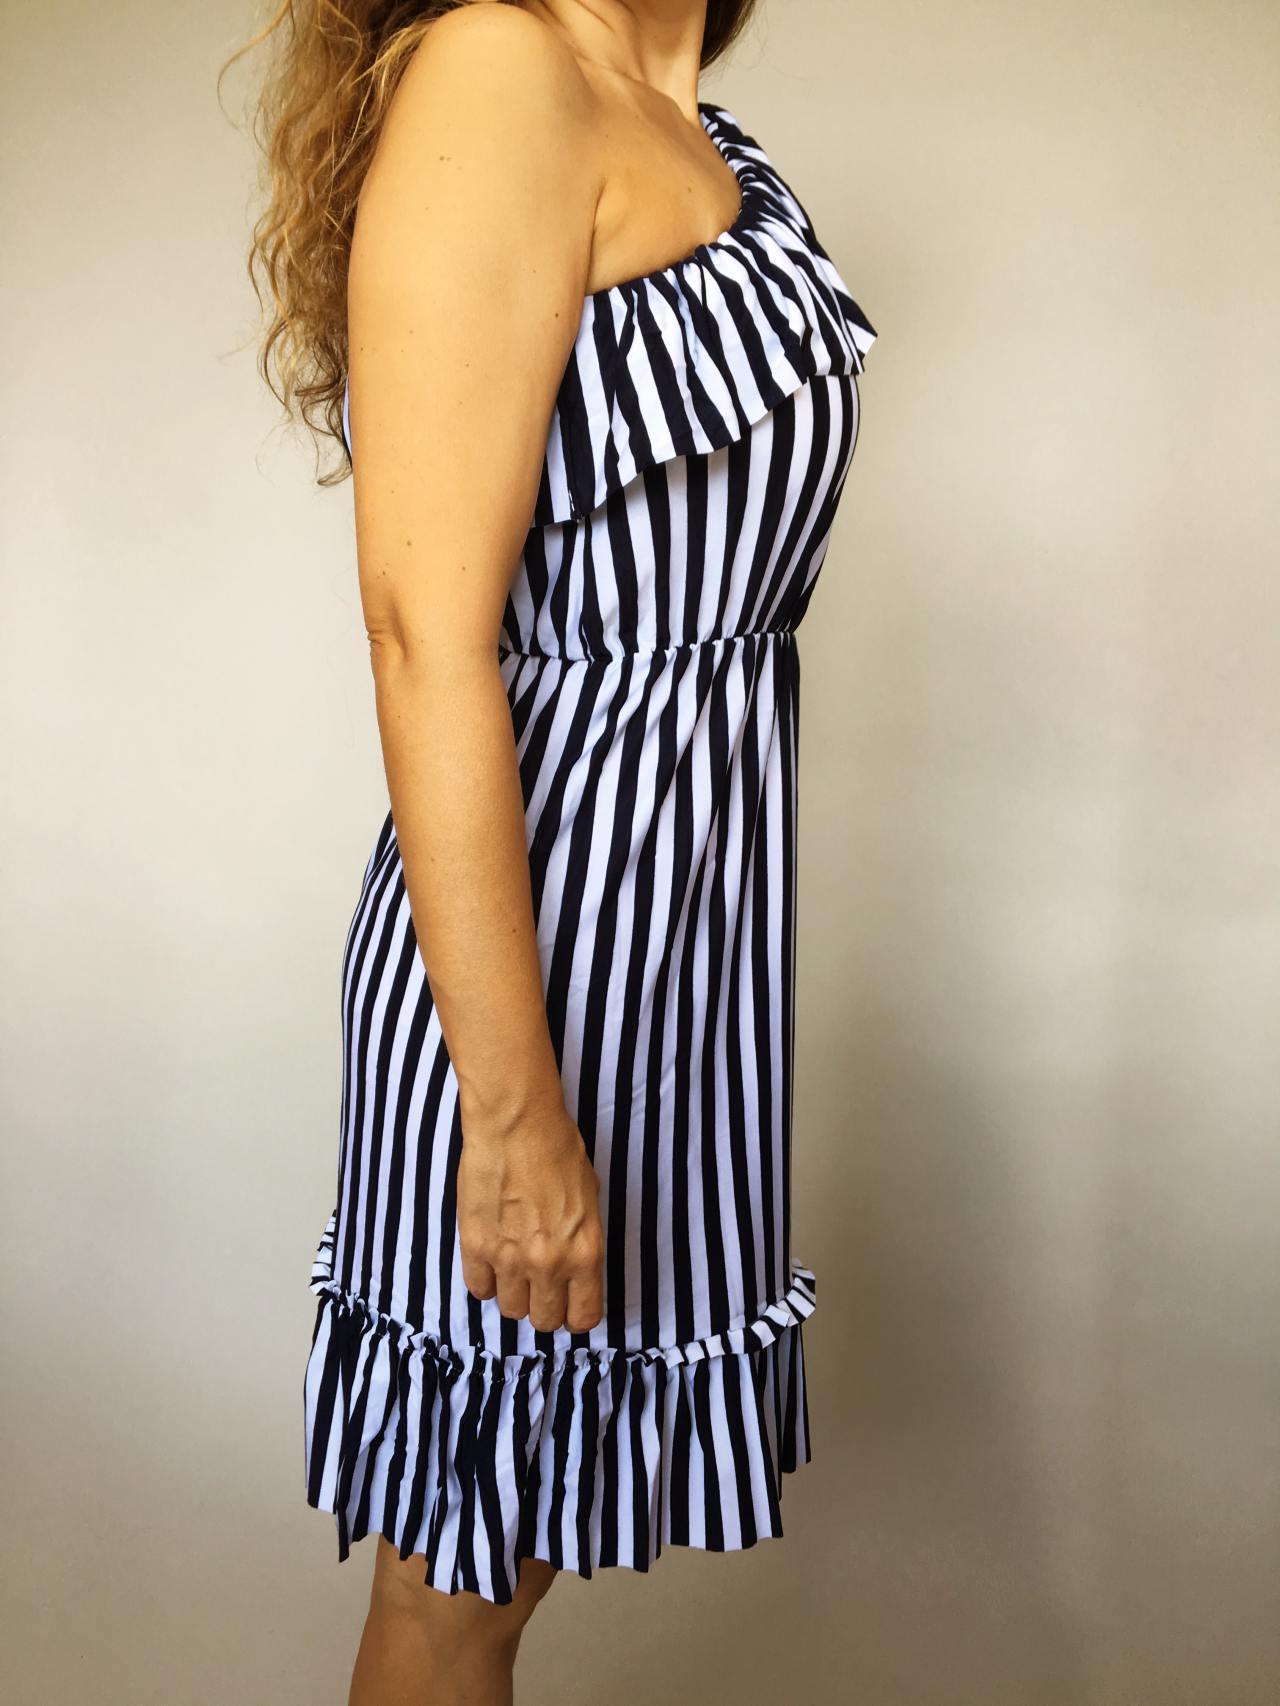 Šaty Corrie bílo modré 03